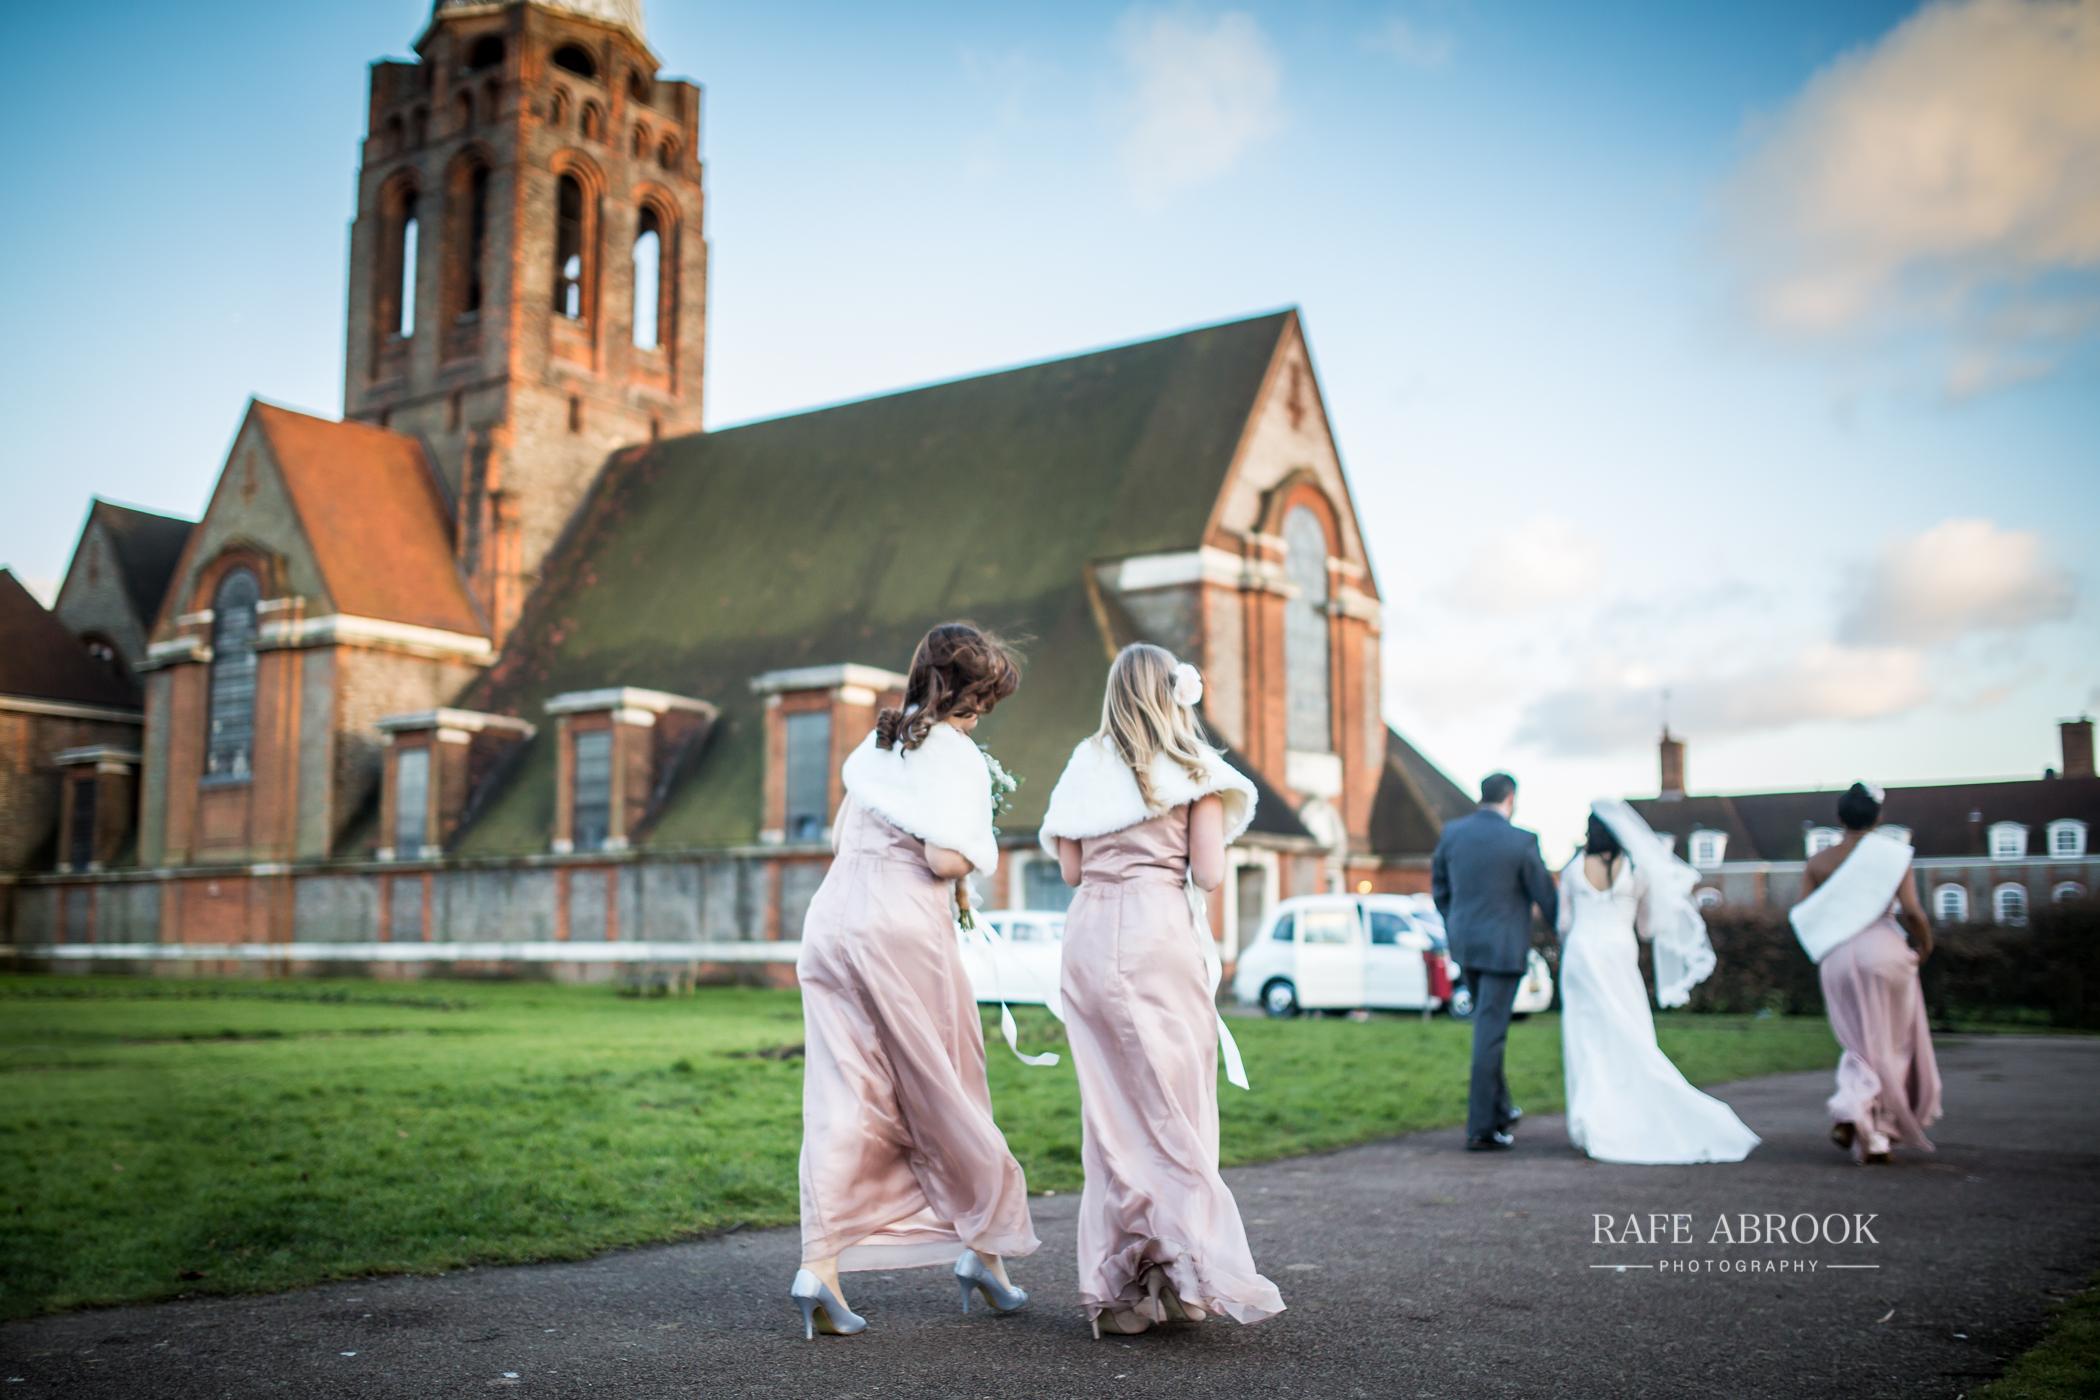 roma & pete wedding hampstead shenley hertfordshire -336.jpg